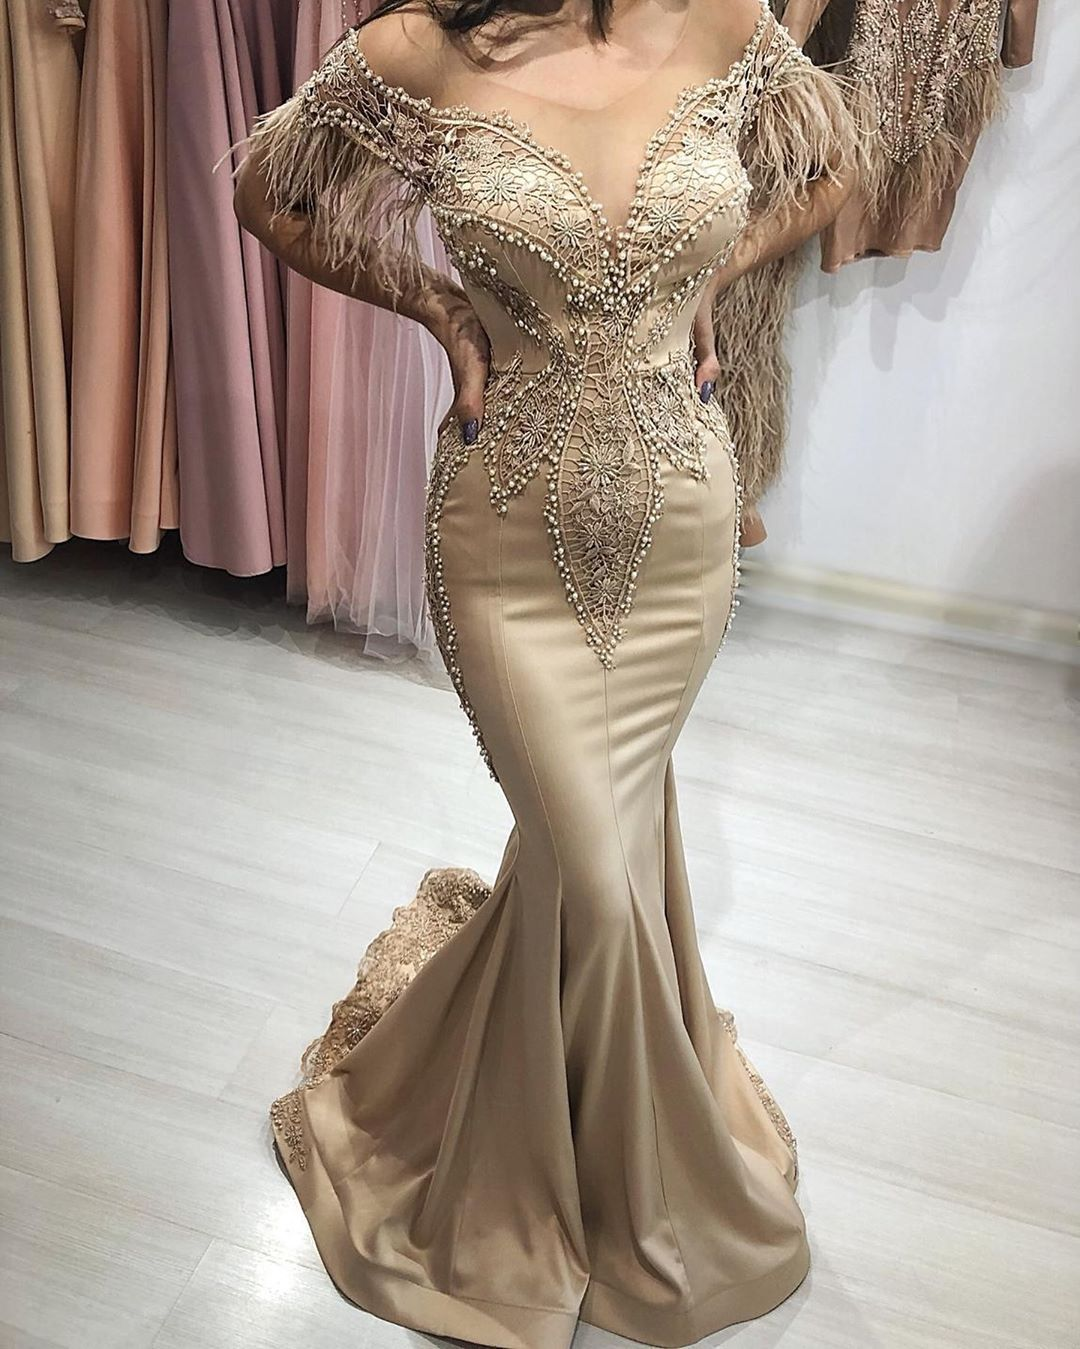 Abendkleid mit Federn  Couture evening dress, Formal ball gown